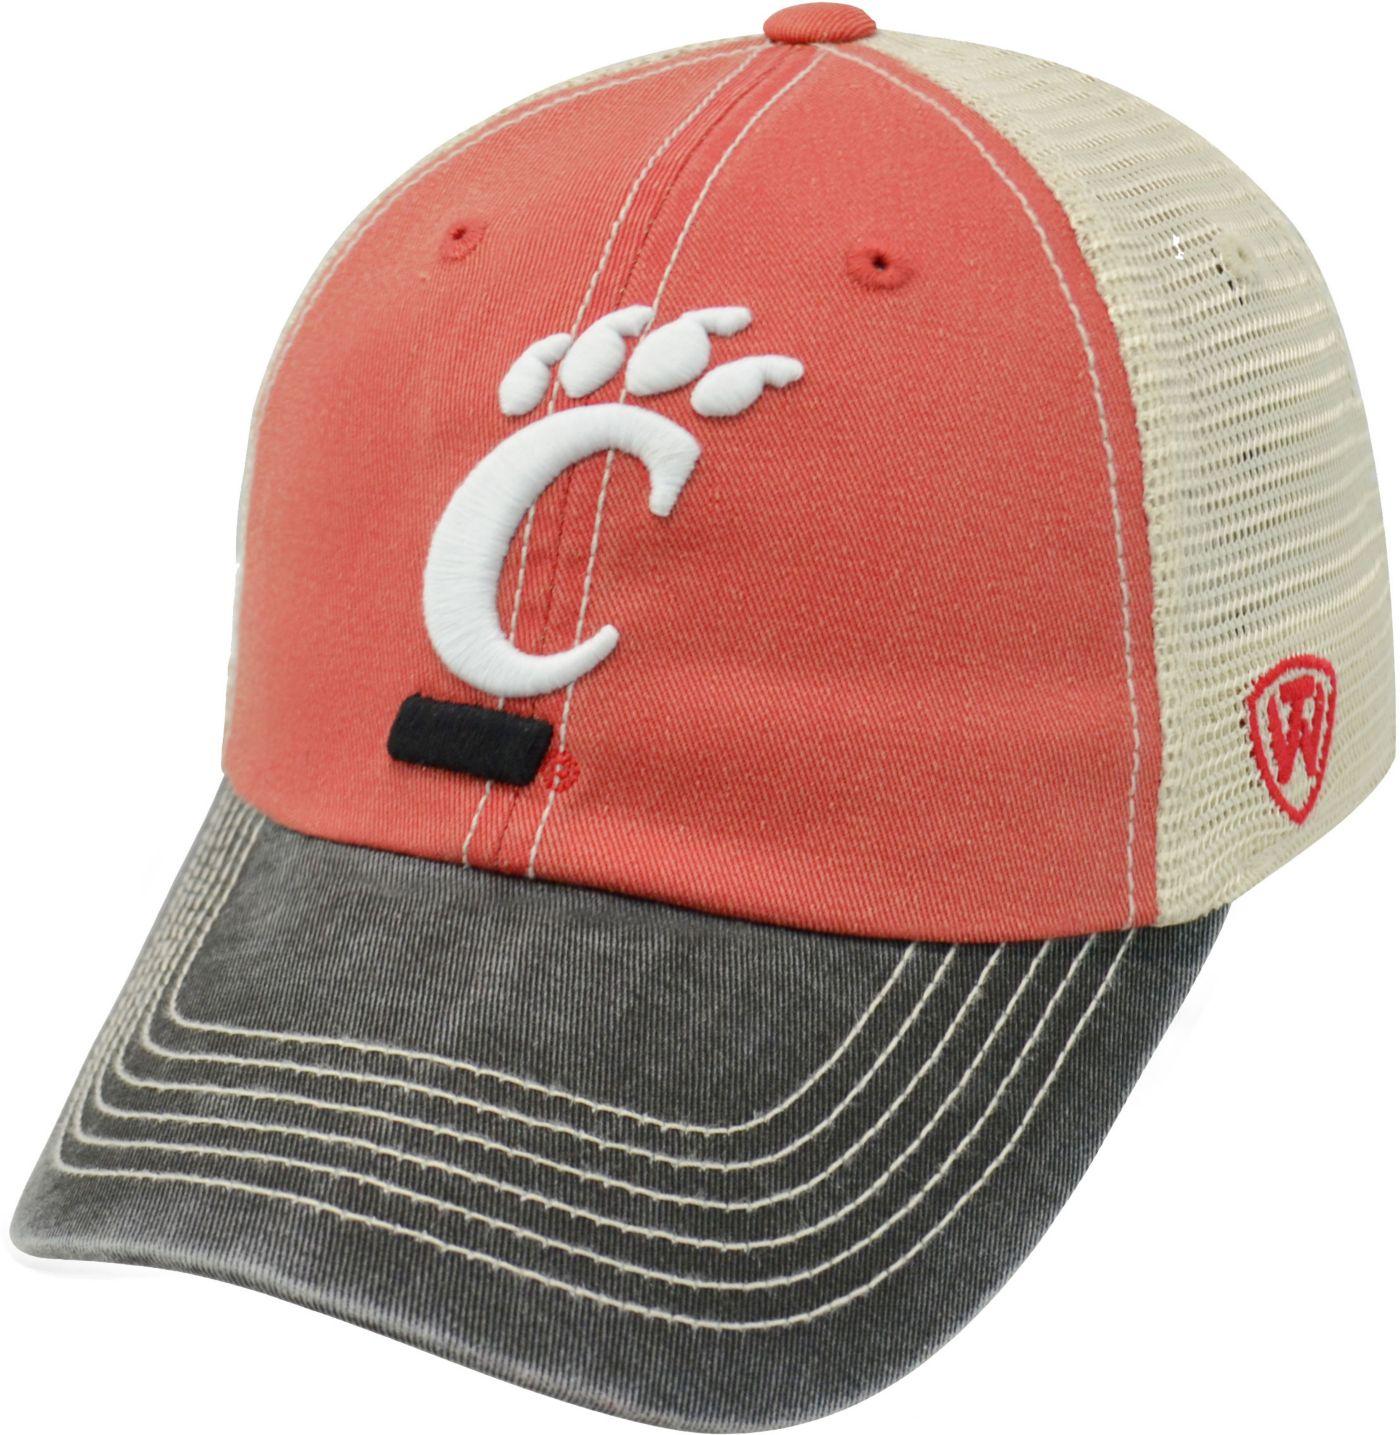 Top of the World Men's Cincinnati Bearcats Red/White/Black Off Road Adjustable Hat